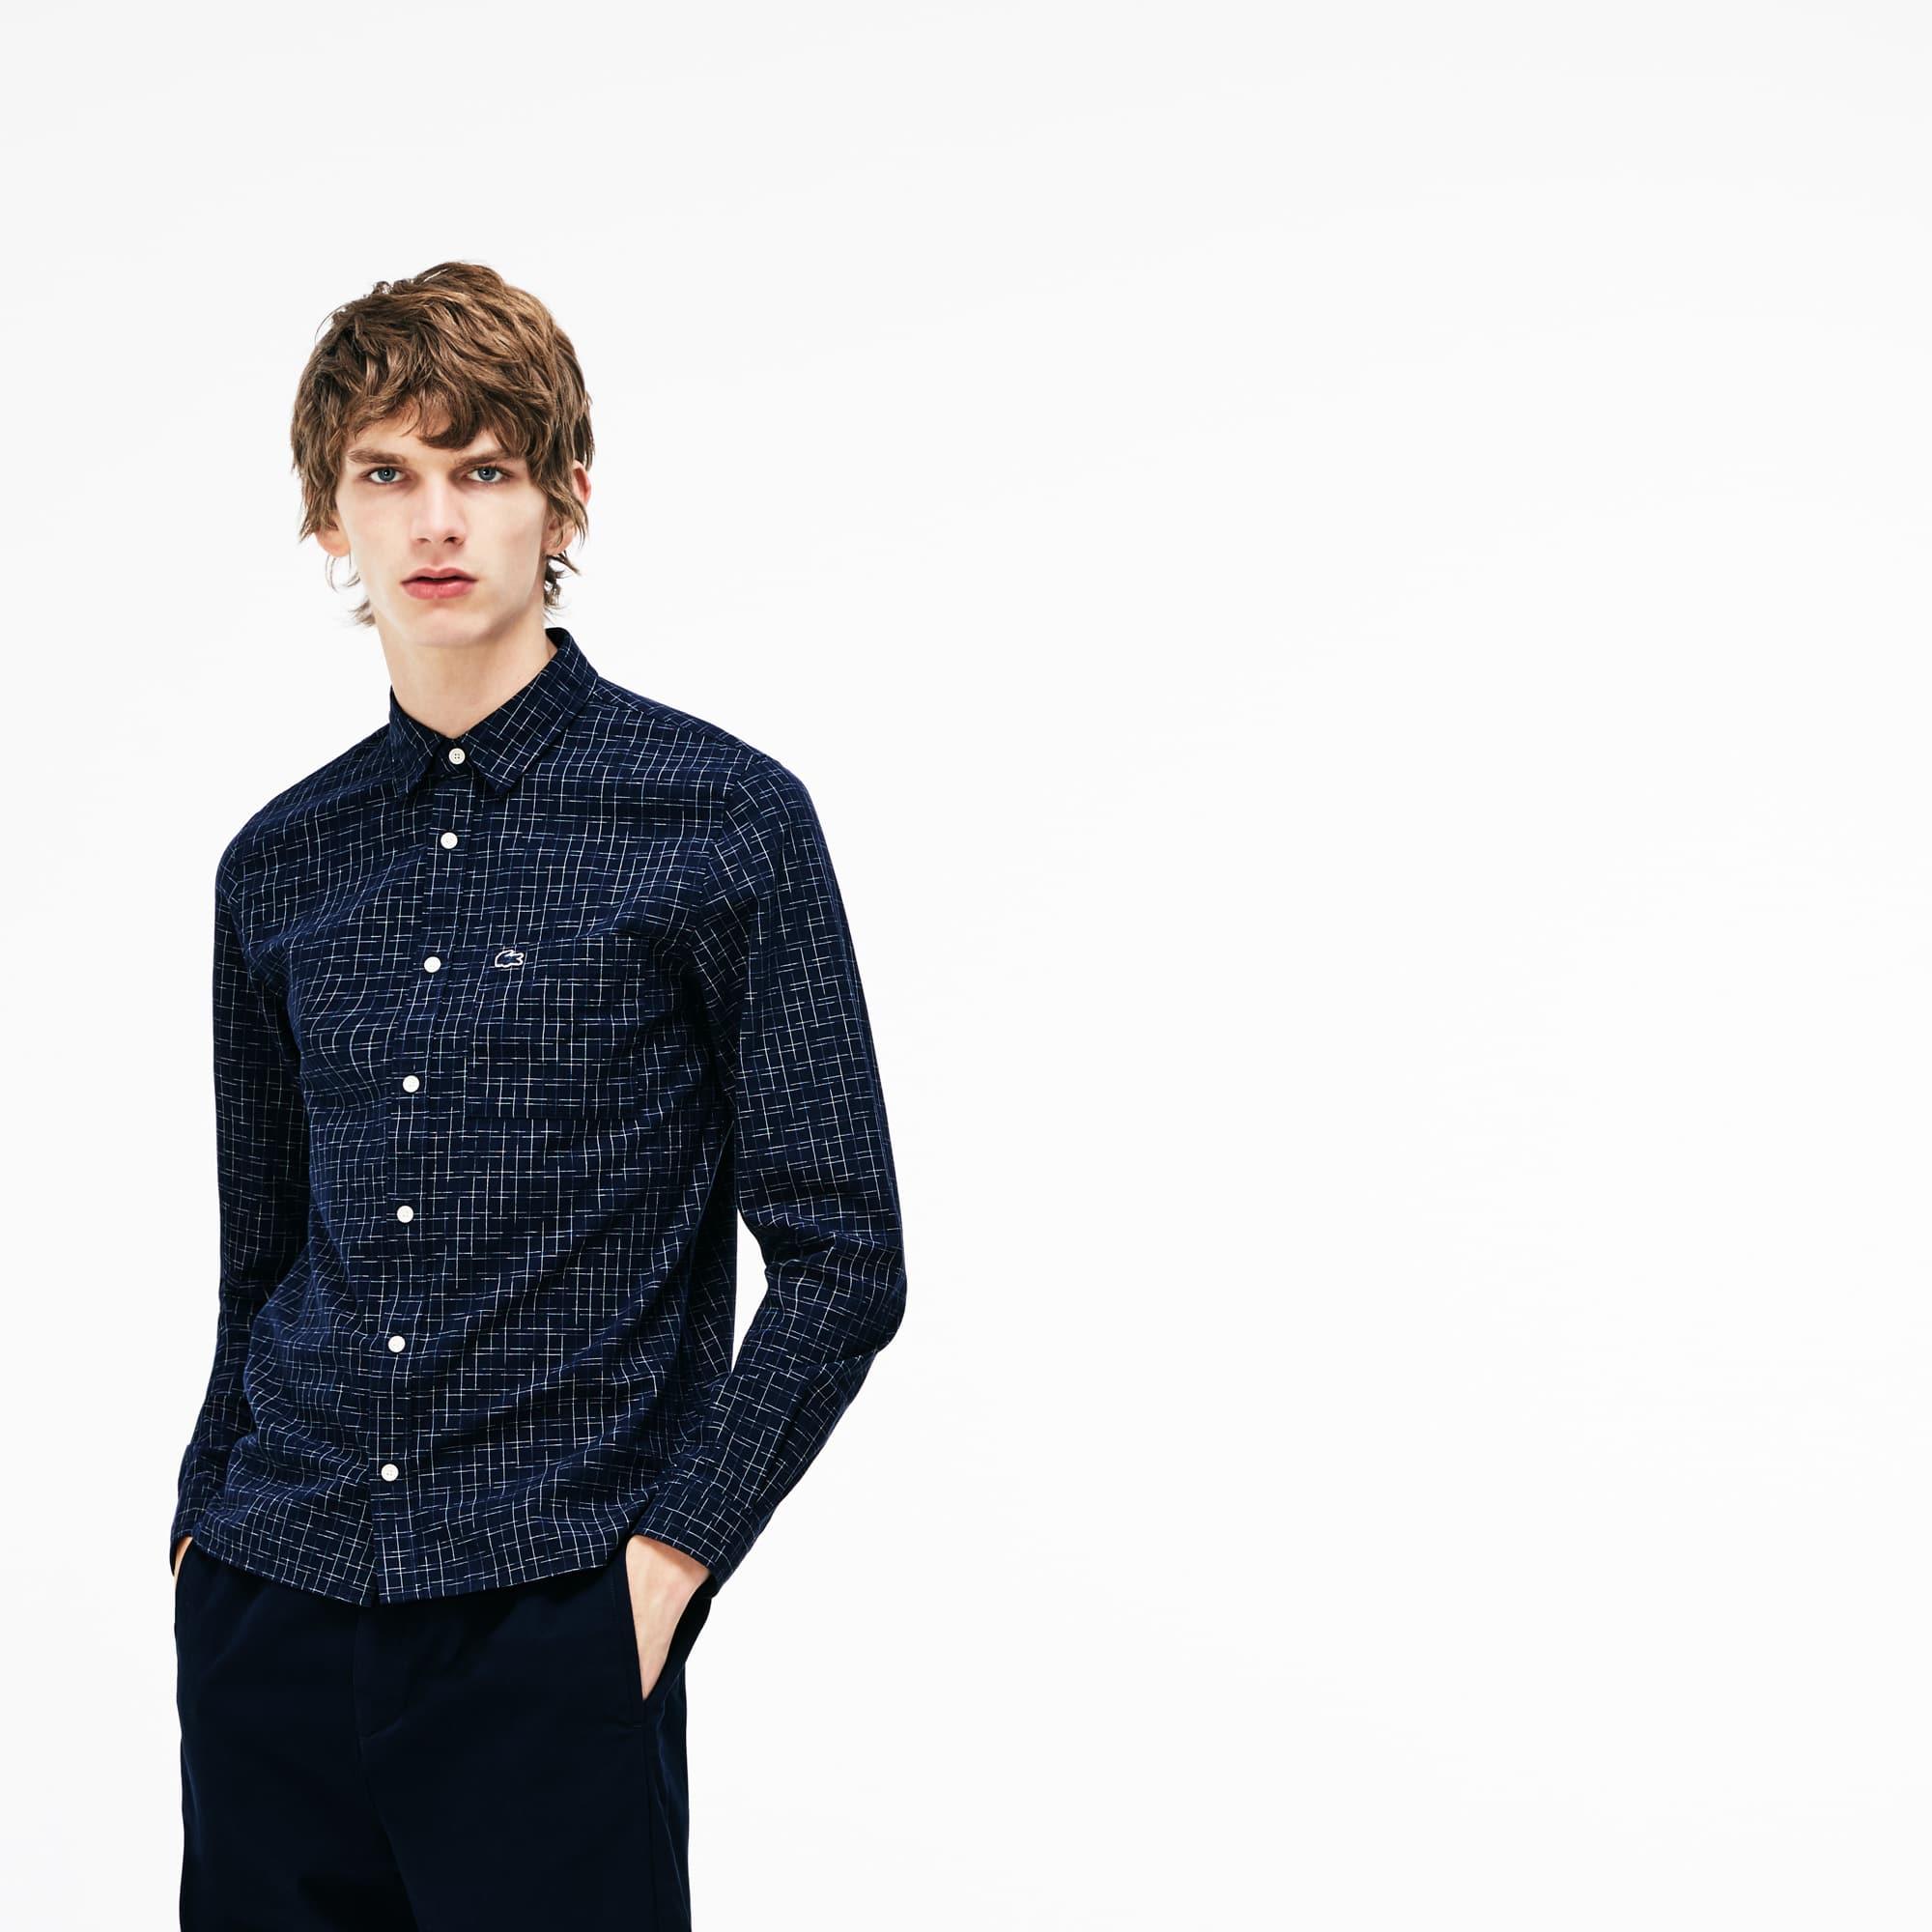 Camisa De Hombre Slim Fit En Popelín Con Estampado Ikat Desgastado ·  PLP Content Brand SS19 GuideChemise Landing 66ed556b827ab